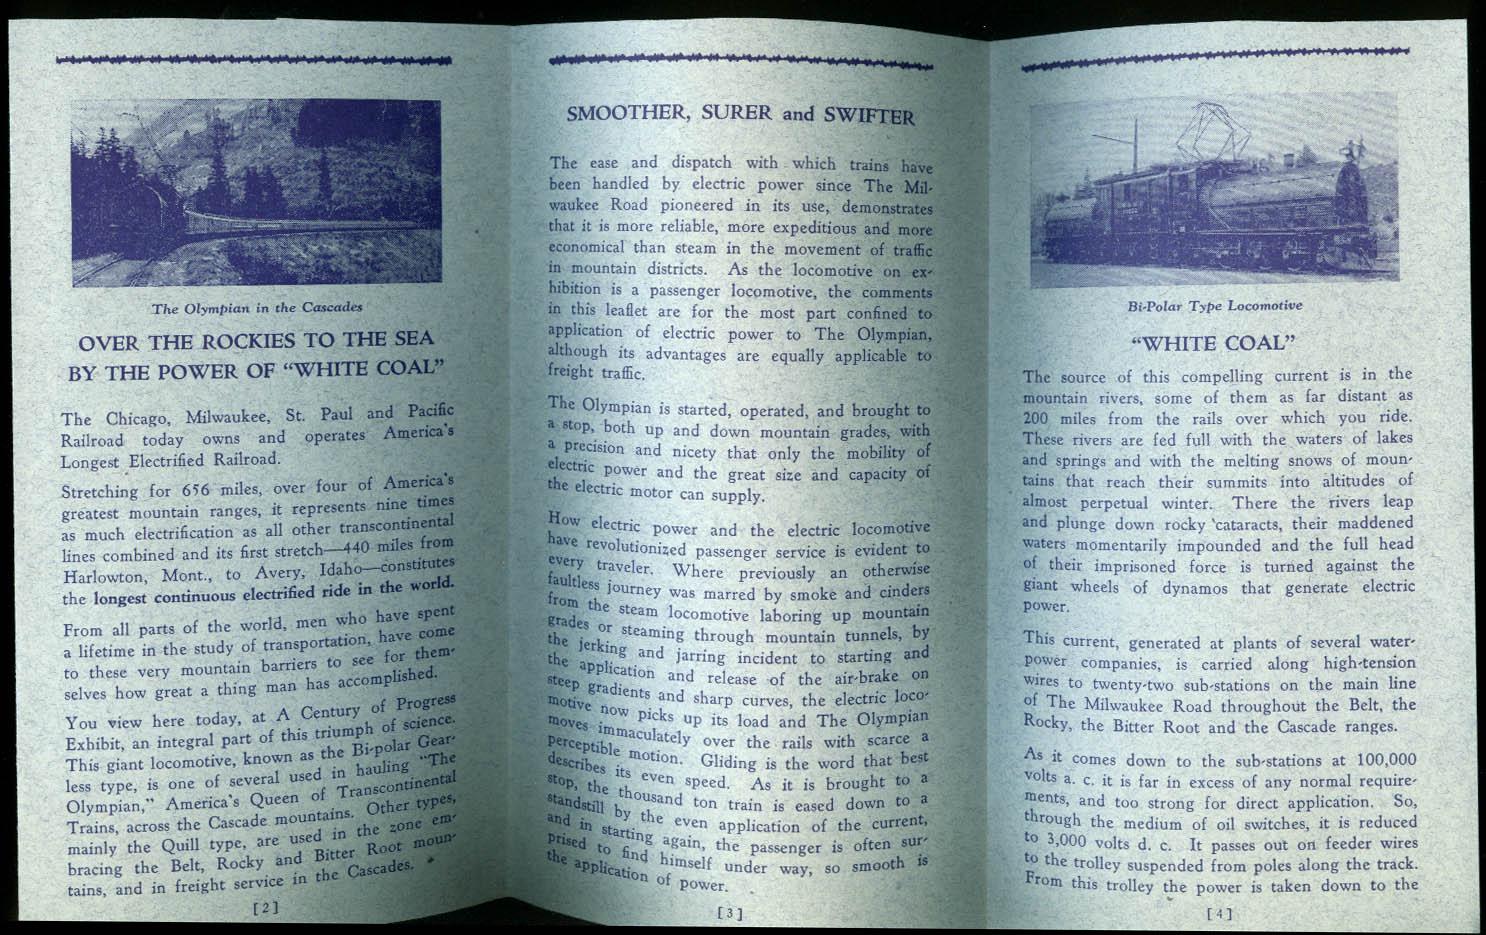 Sparks Milwaukee Road Electrification Exhibit Century of Progress 1933 folder